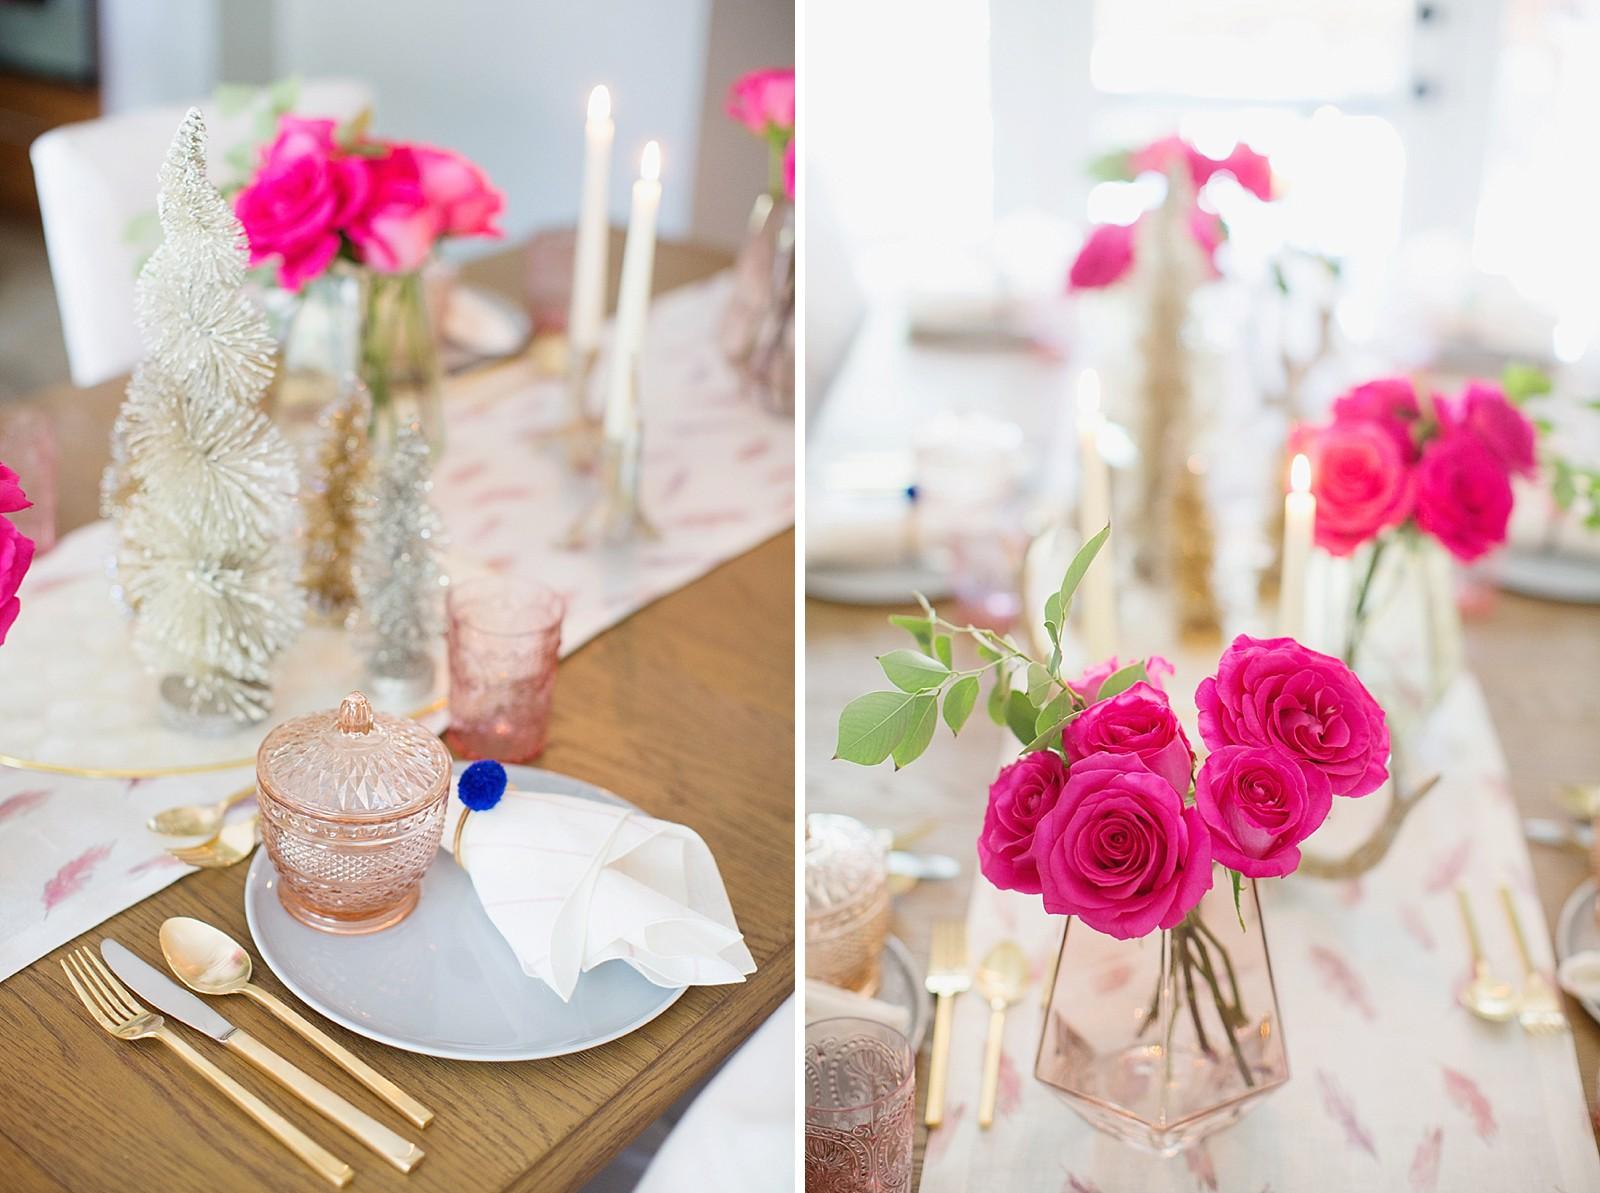 minted-christmas-inspiration-girls-party-photos-diana-elizabeth-blog-lifestyle-hostess-entertainment-home-blog-2251